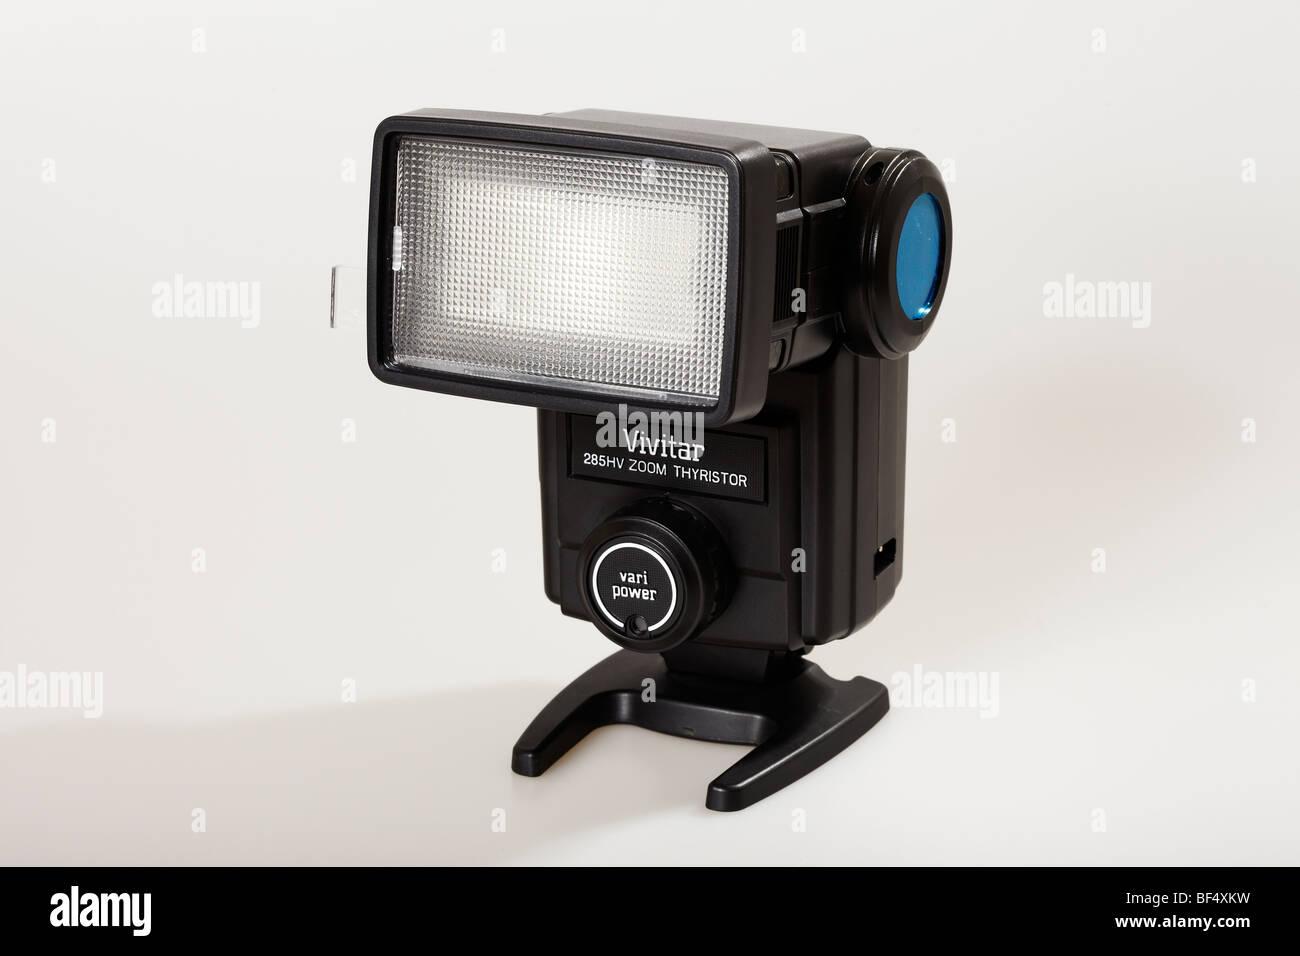 Flashgun or Strobe Light for Photography - Stock Image